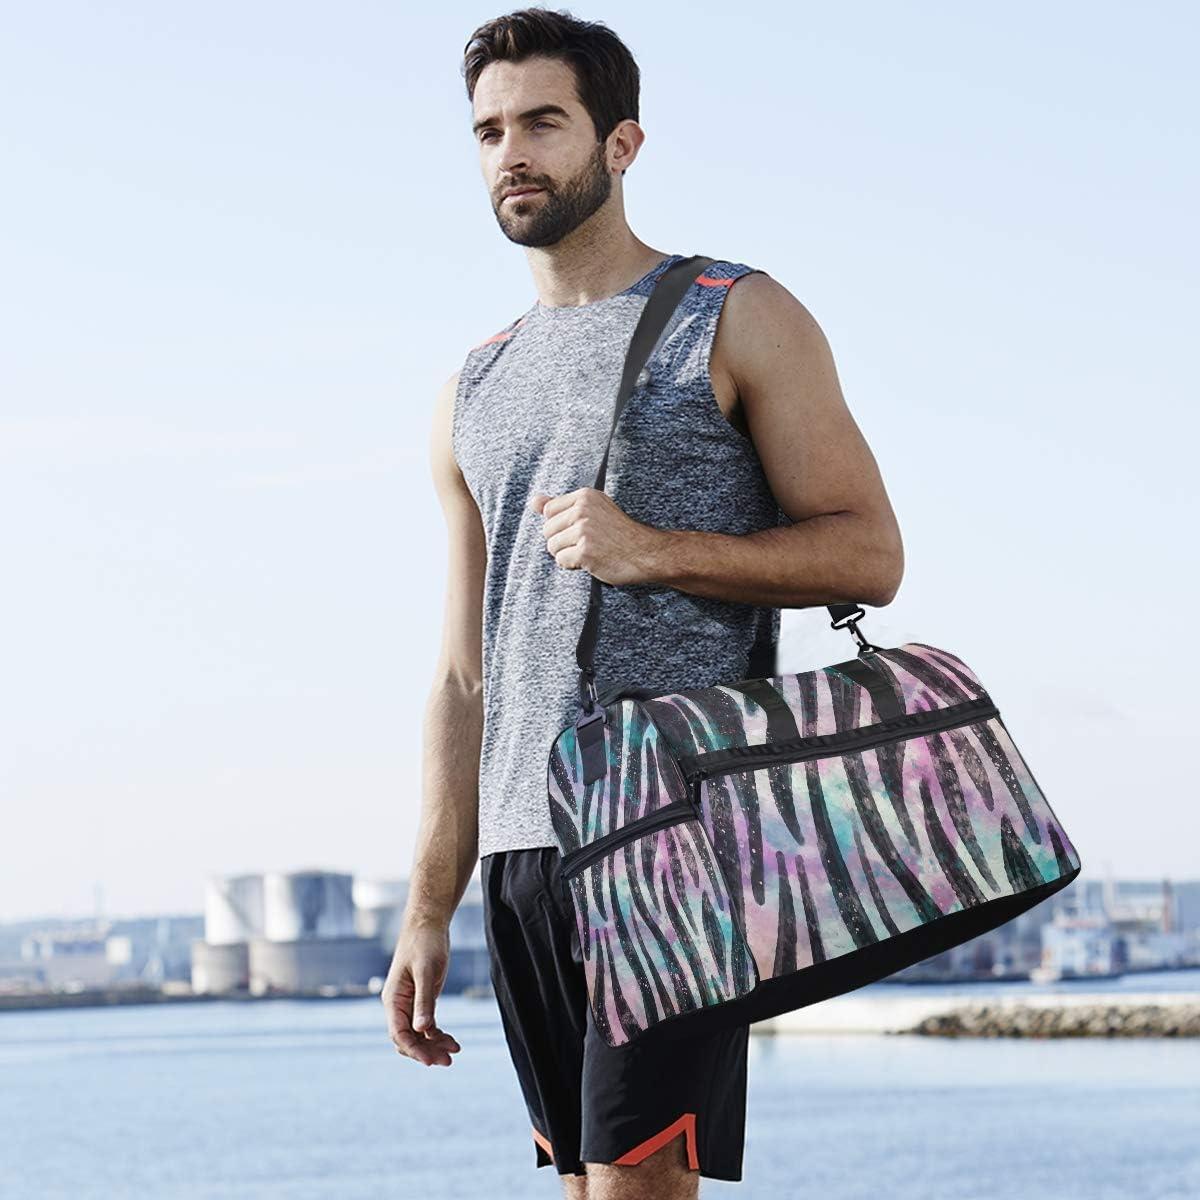 Travel Duffels Black Stripe Texture Duffle Bag Luggage Sports Gym for Women /& Men